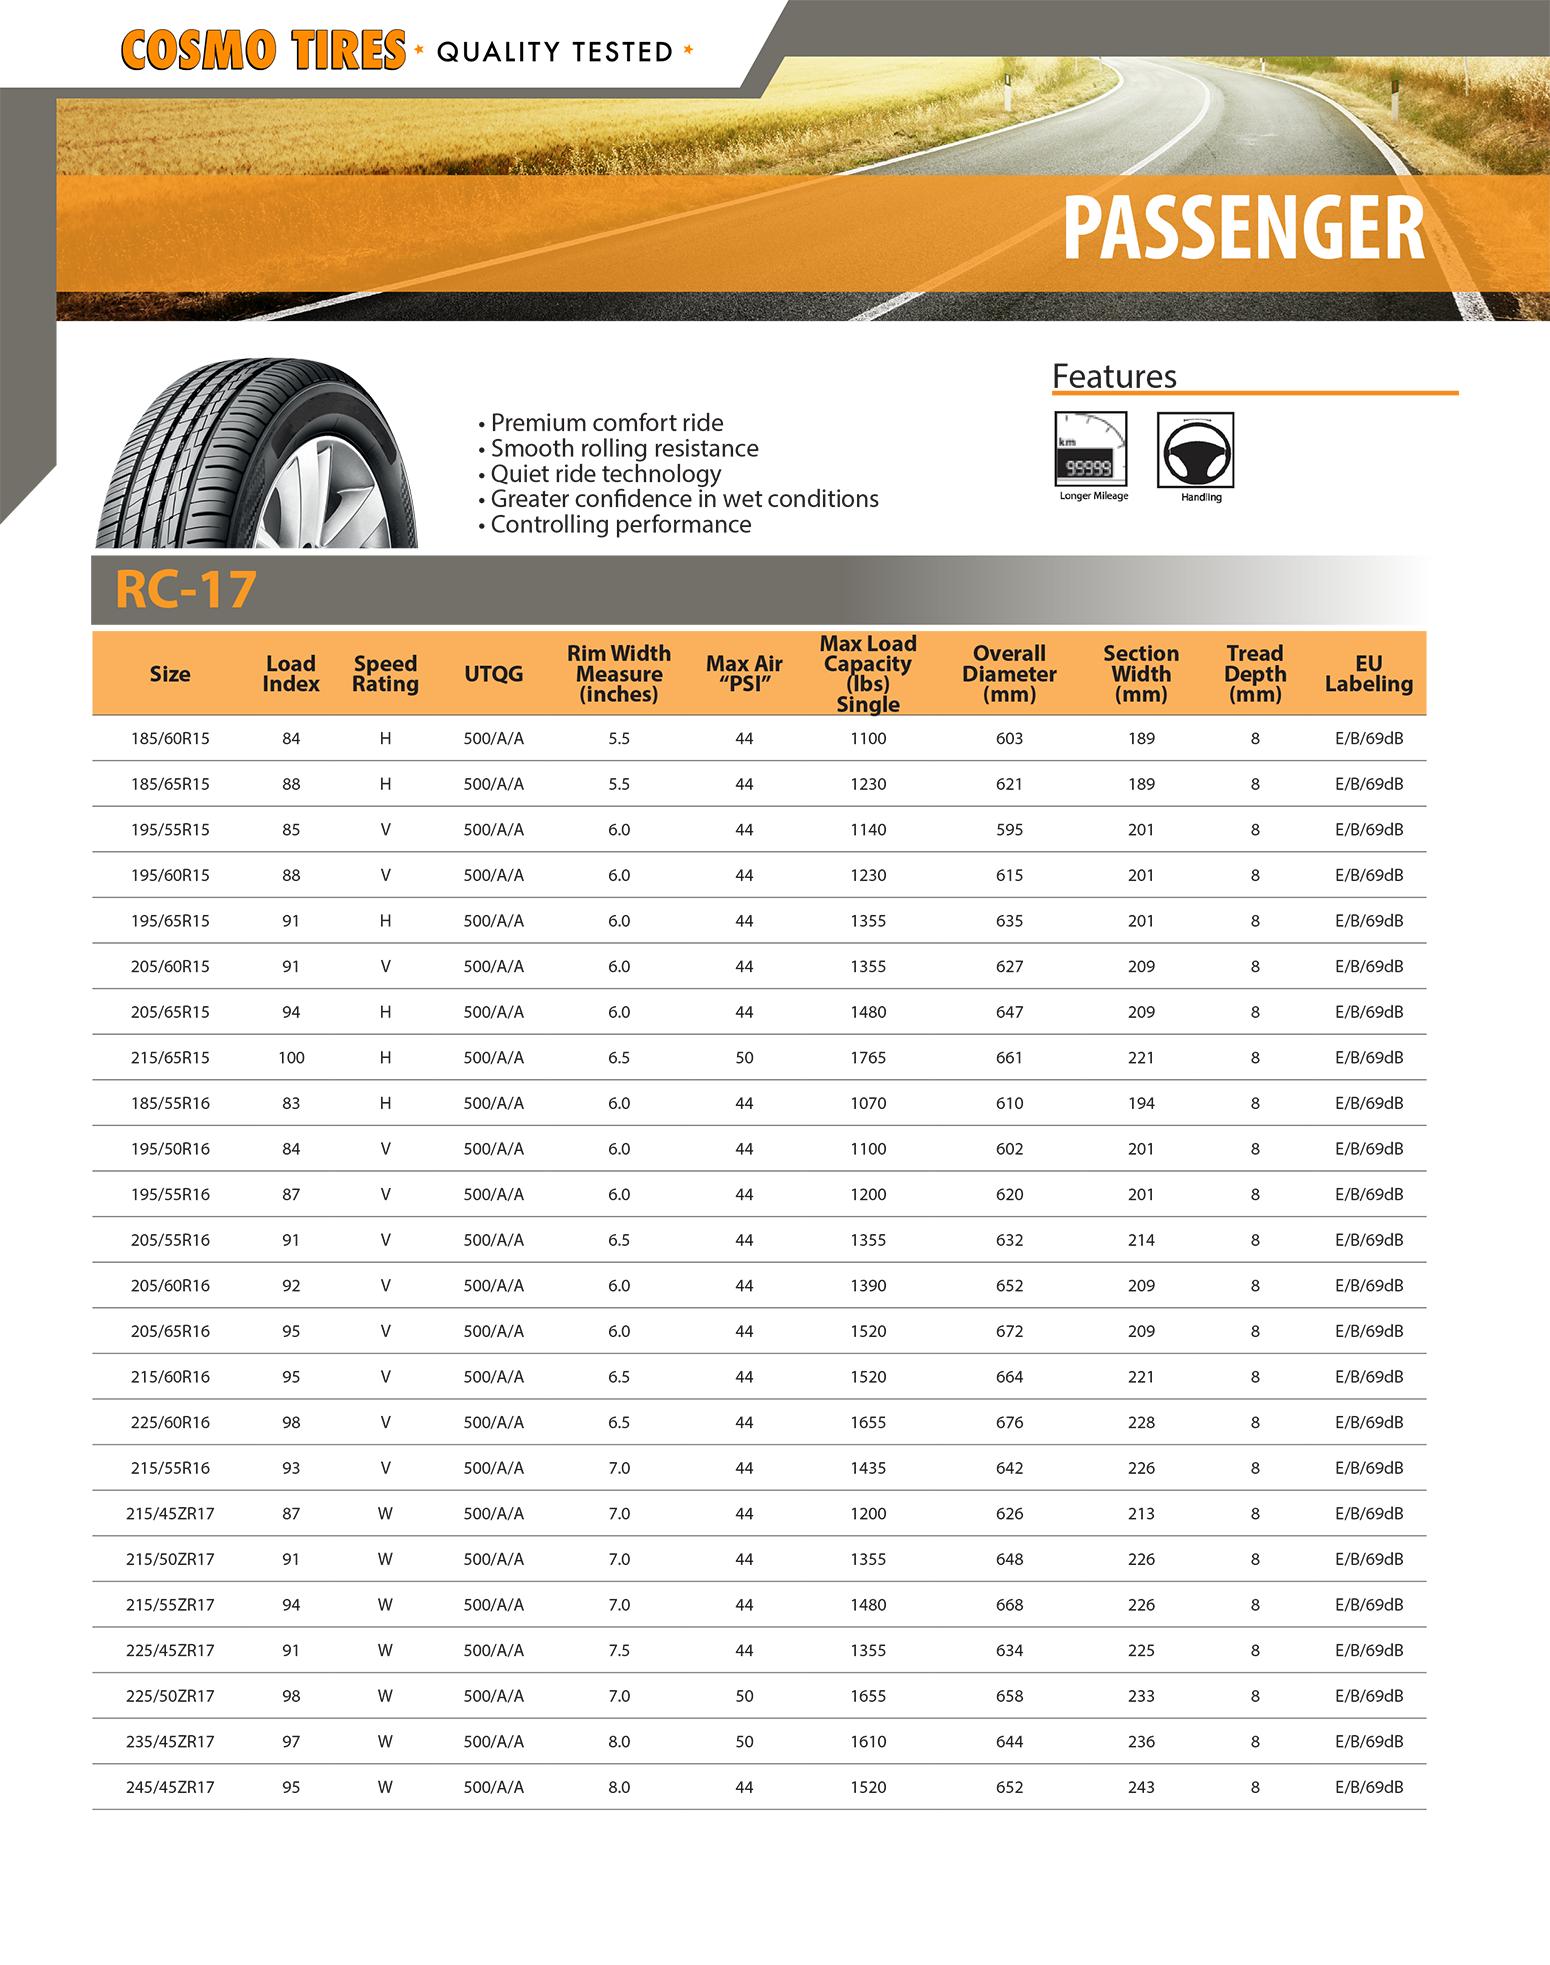 passenger tires.png